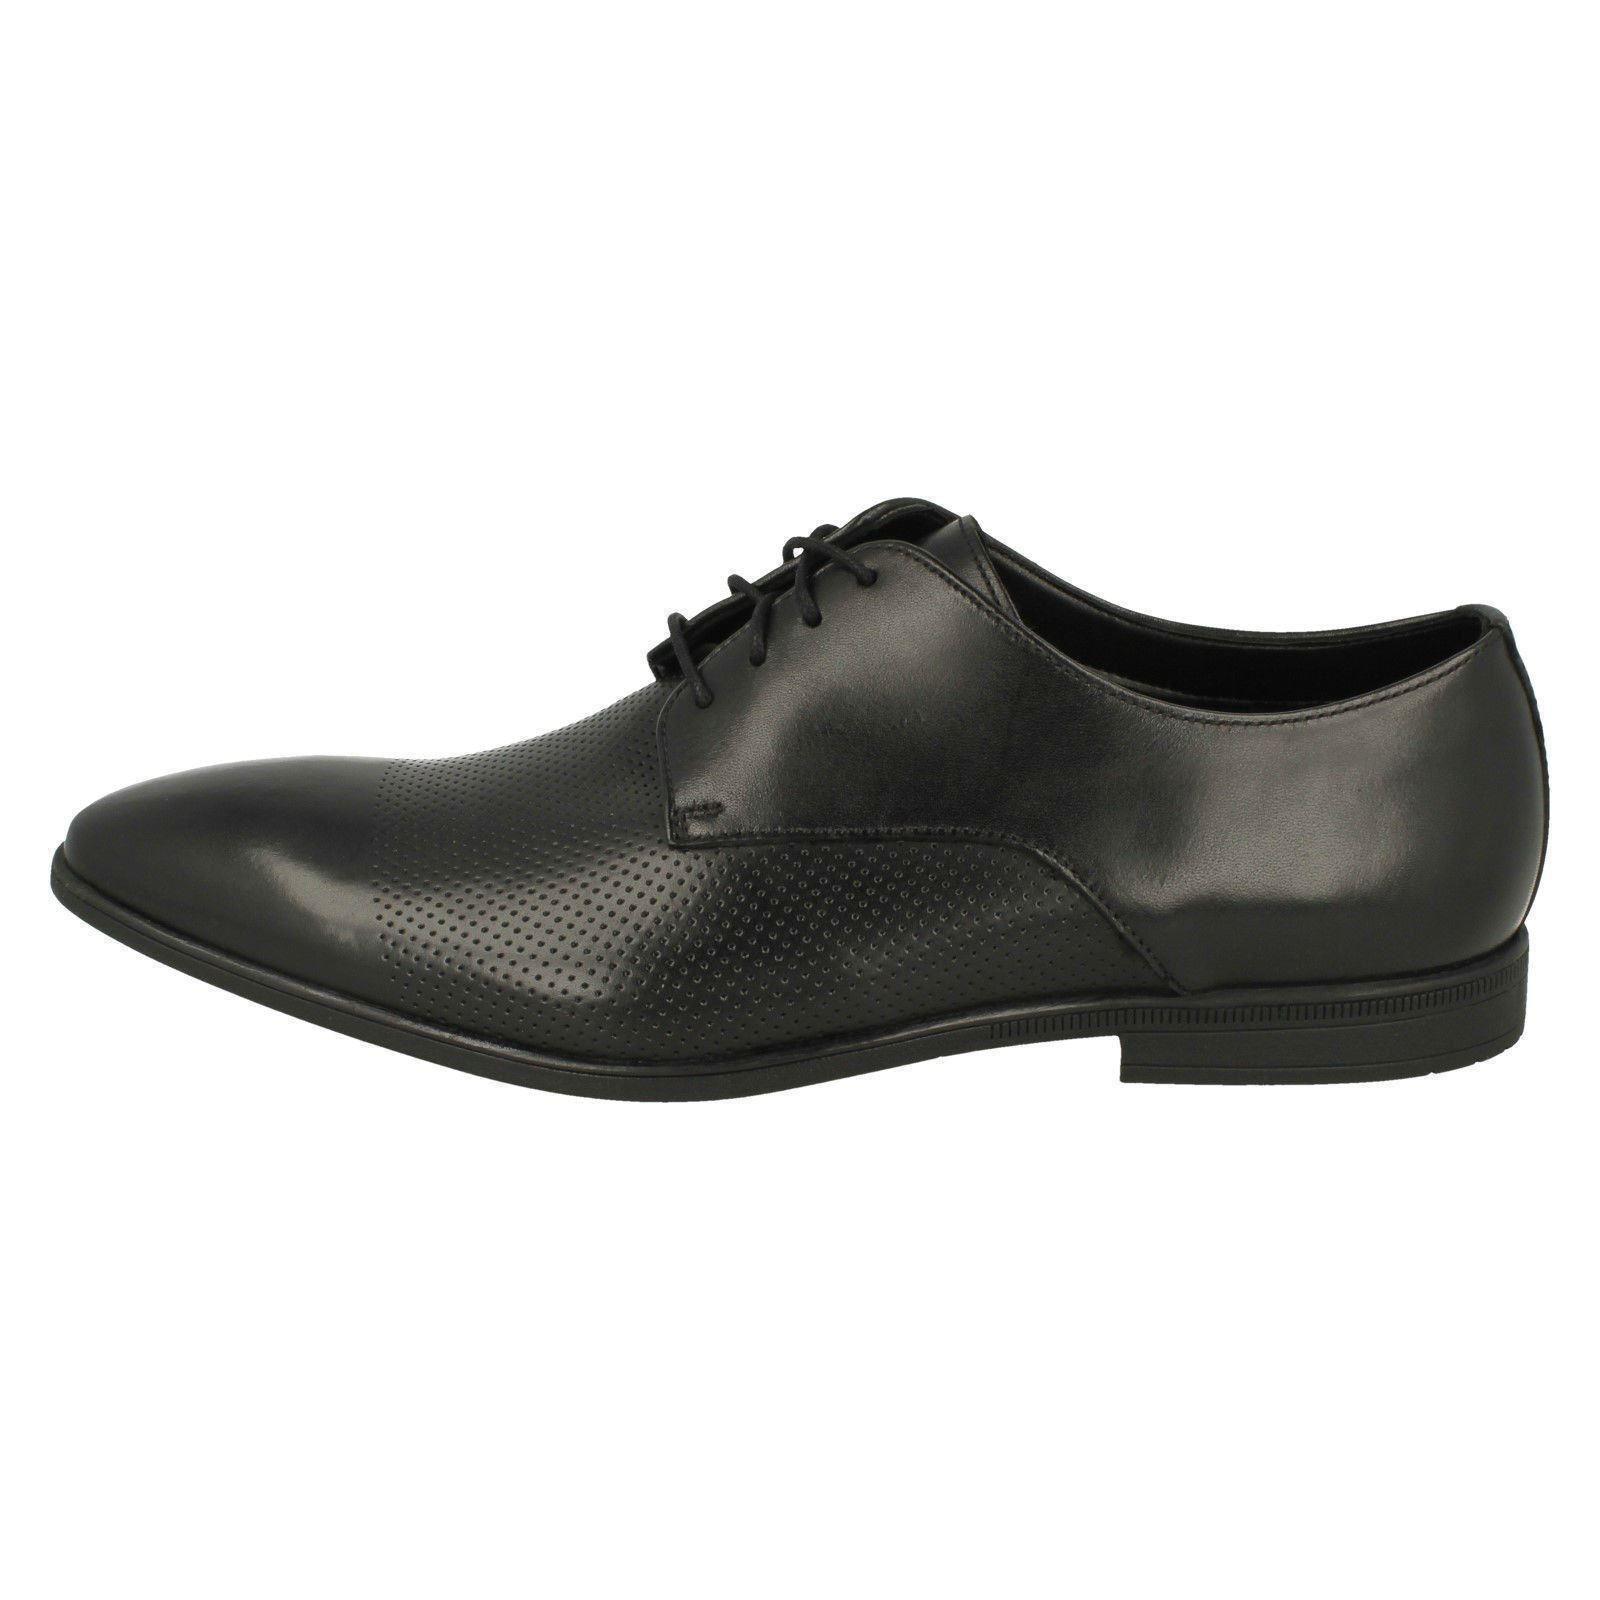 Clarks Hombre Zapatos Con Cordones Estilo Formal Bampton Gorra Zapatos De Vestir